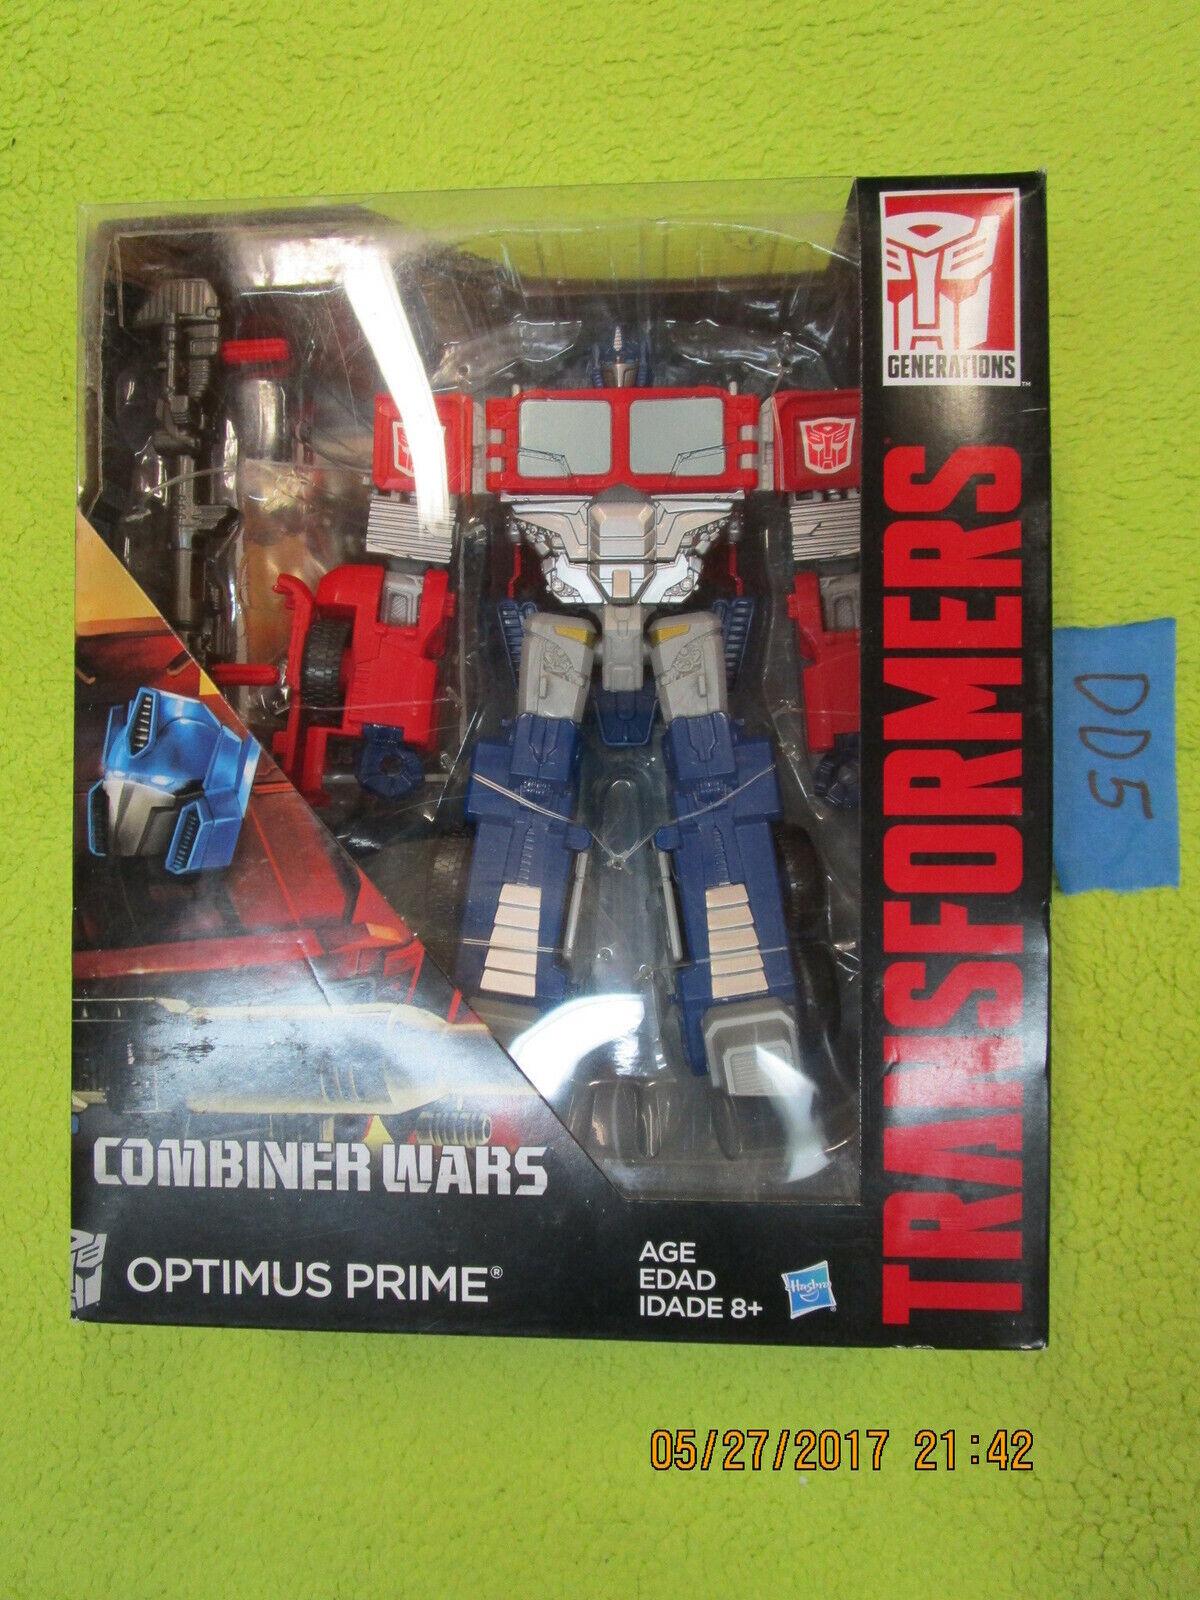 FF5 Transformers Generationer Lot CombNER VAROR G1 OPTIMUS PRIME Voyager klass Cw